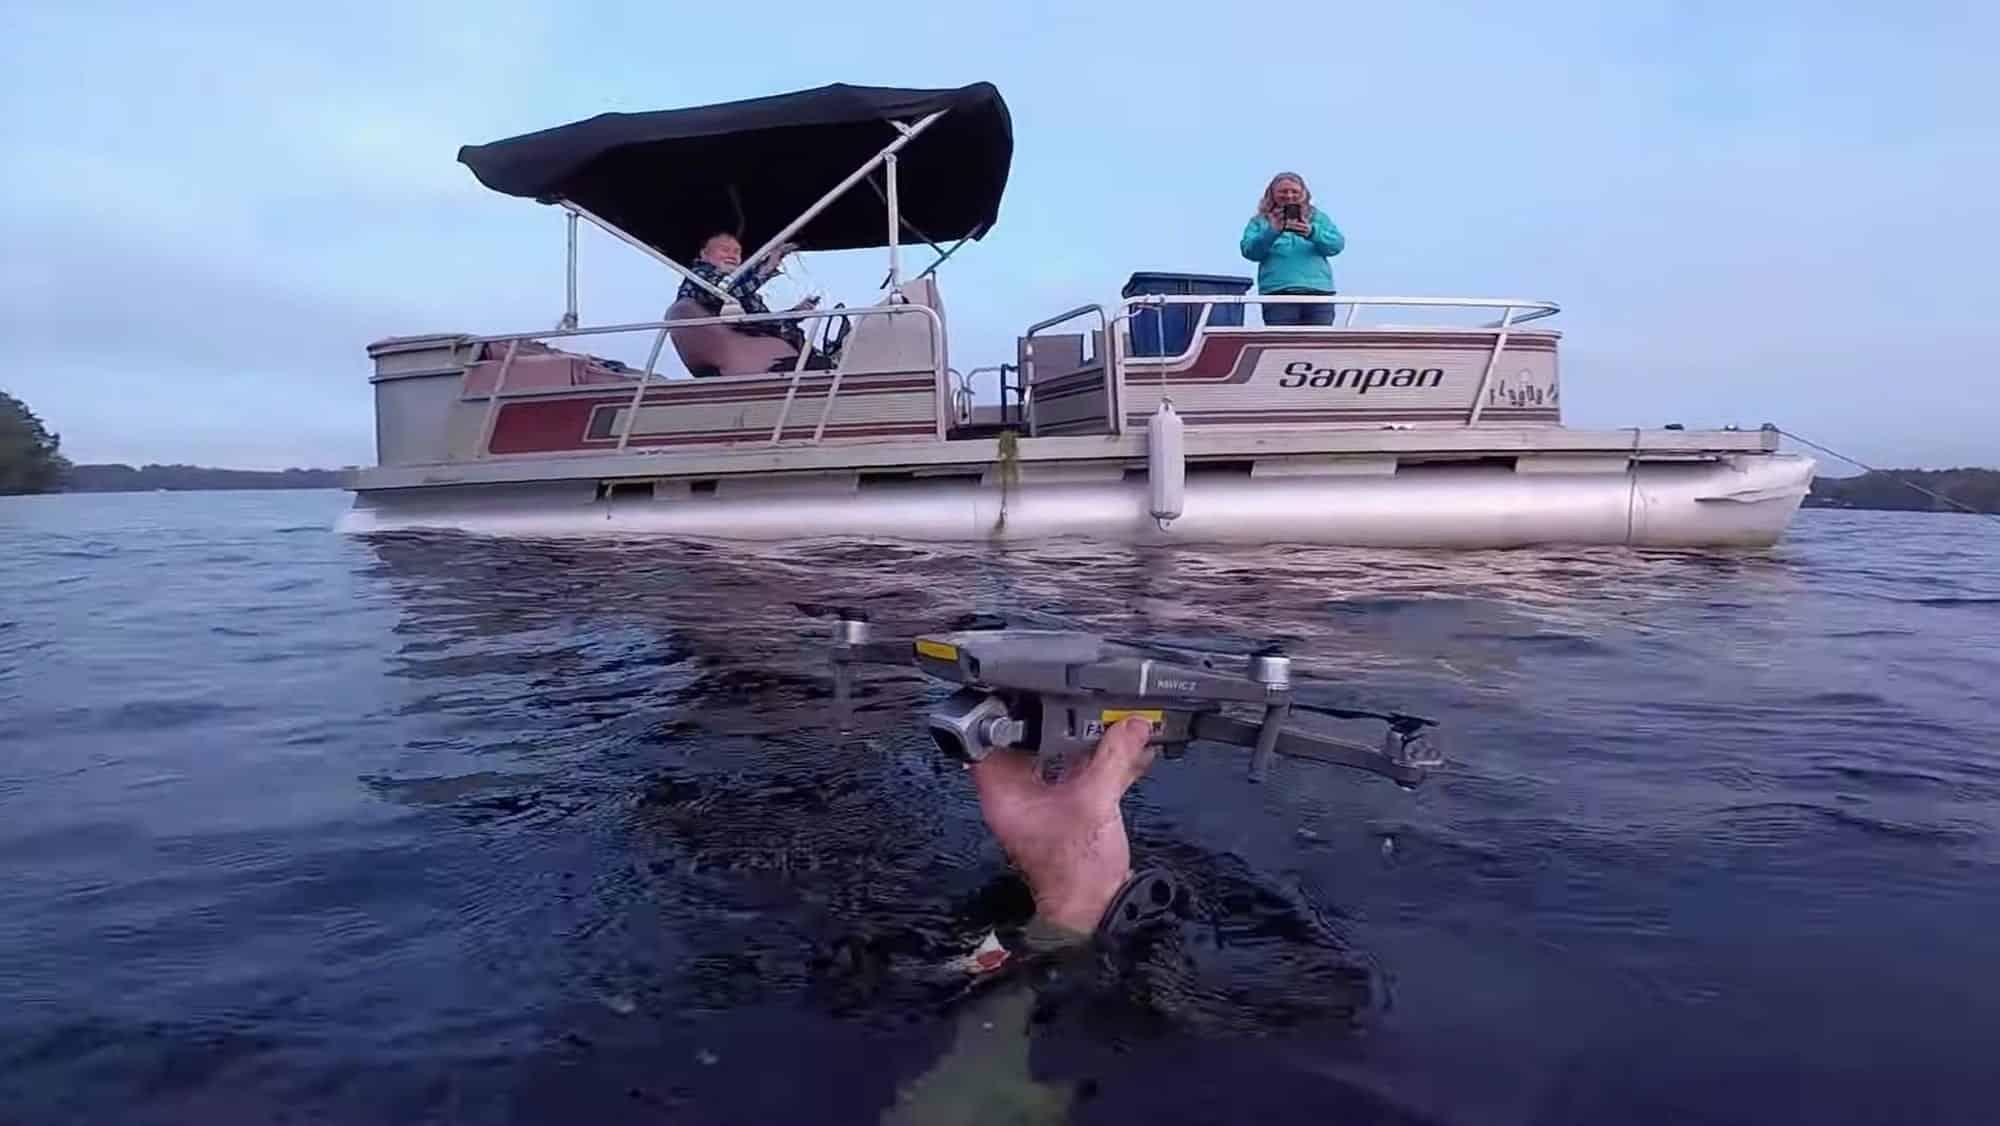 Diver retrieves DJI Mavic Pro 2 from a lake